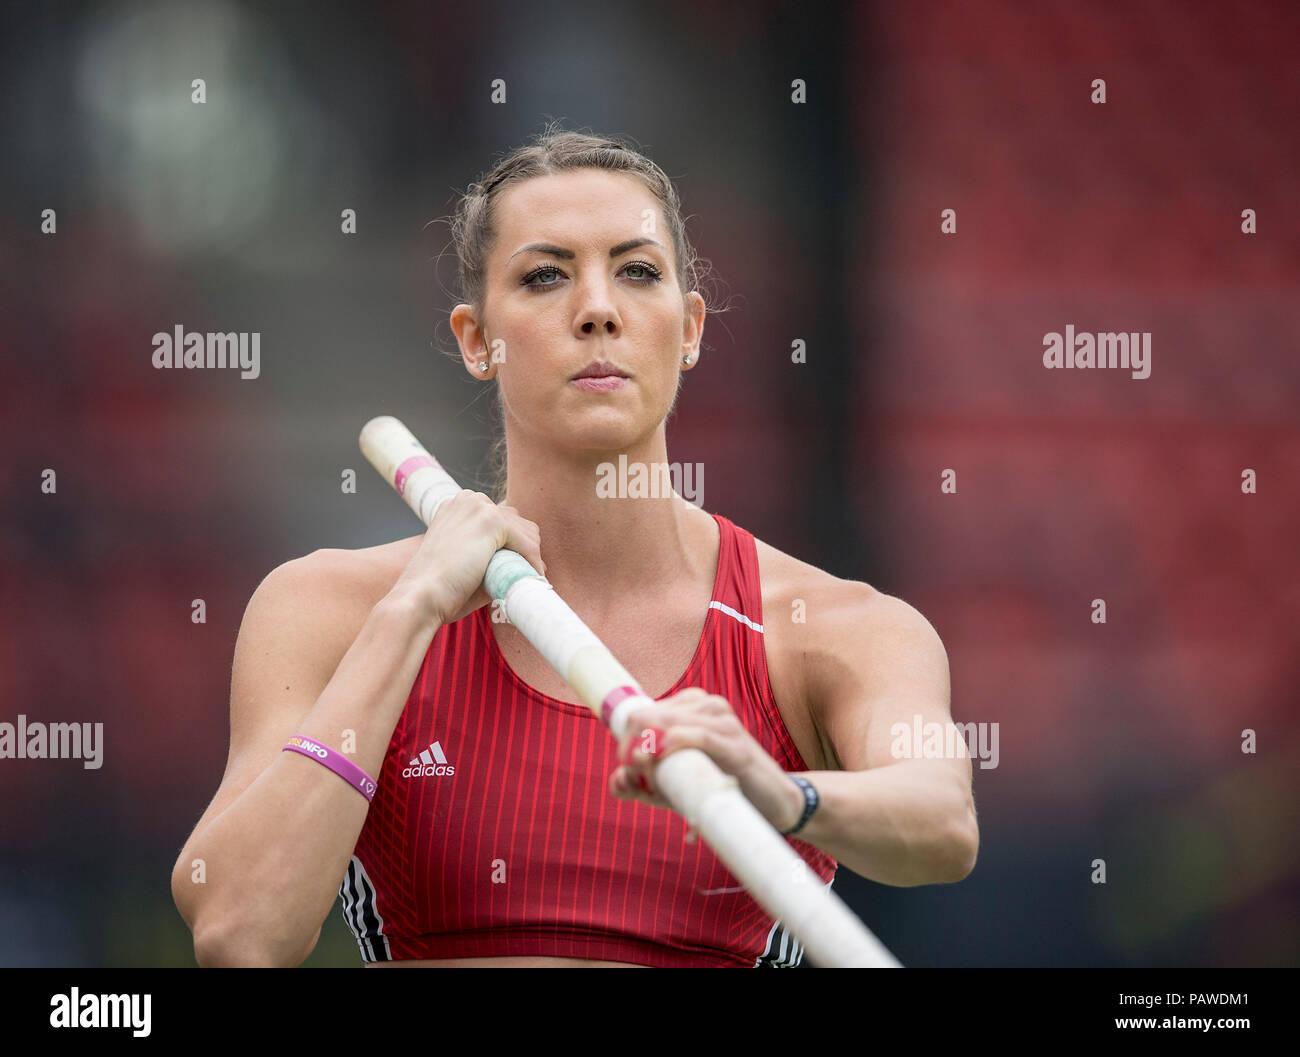 Nuremberg, Deutschland. 22nd July, 2018. Katharina BAUER, TSV Bayer 04 Leverkusen, action. Final pole vault of women on 22.07.2018. German Athletics Championships 2018, from 20.07. - 22.07.2018 in Nuernberg/Germany. | usage worldwide Credit: dpa/Alamy Live News Stock Photo